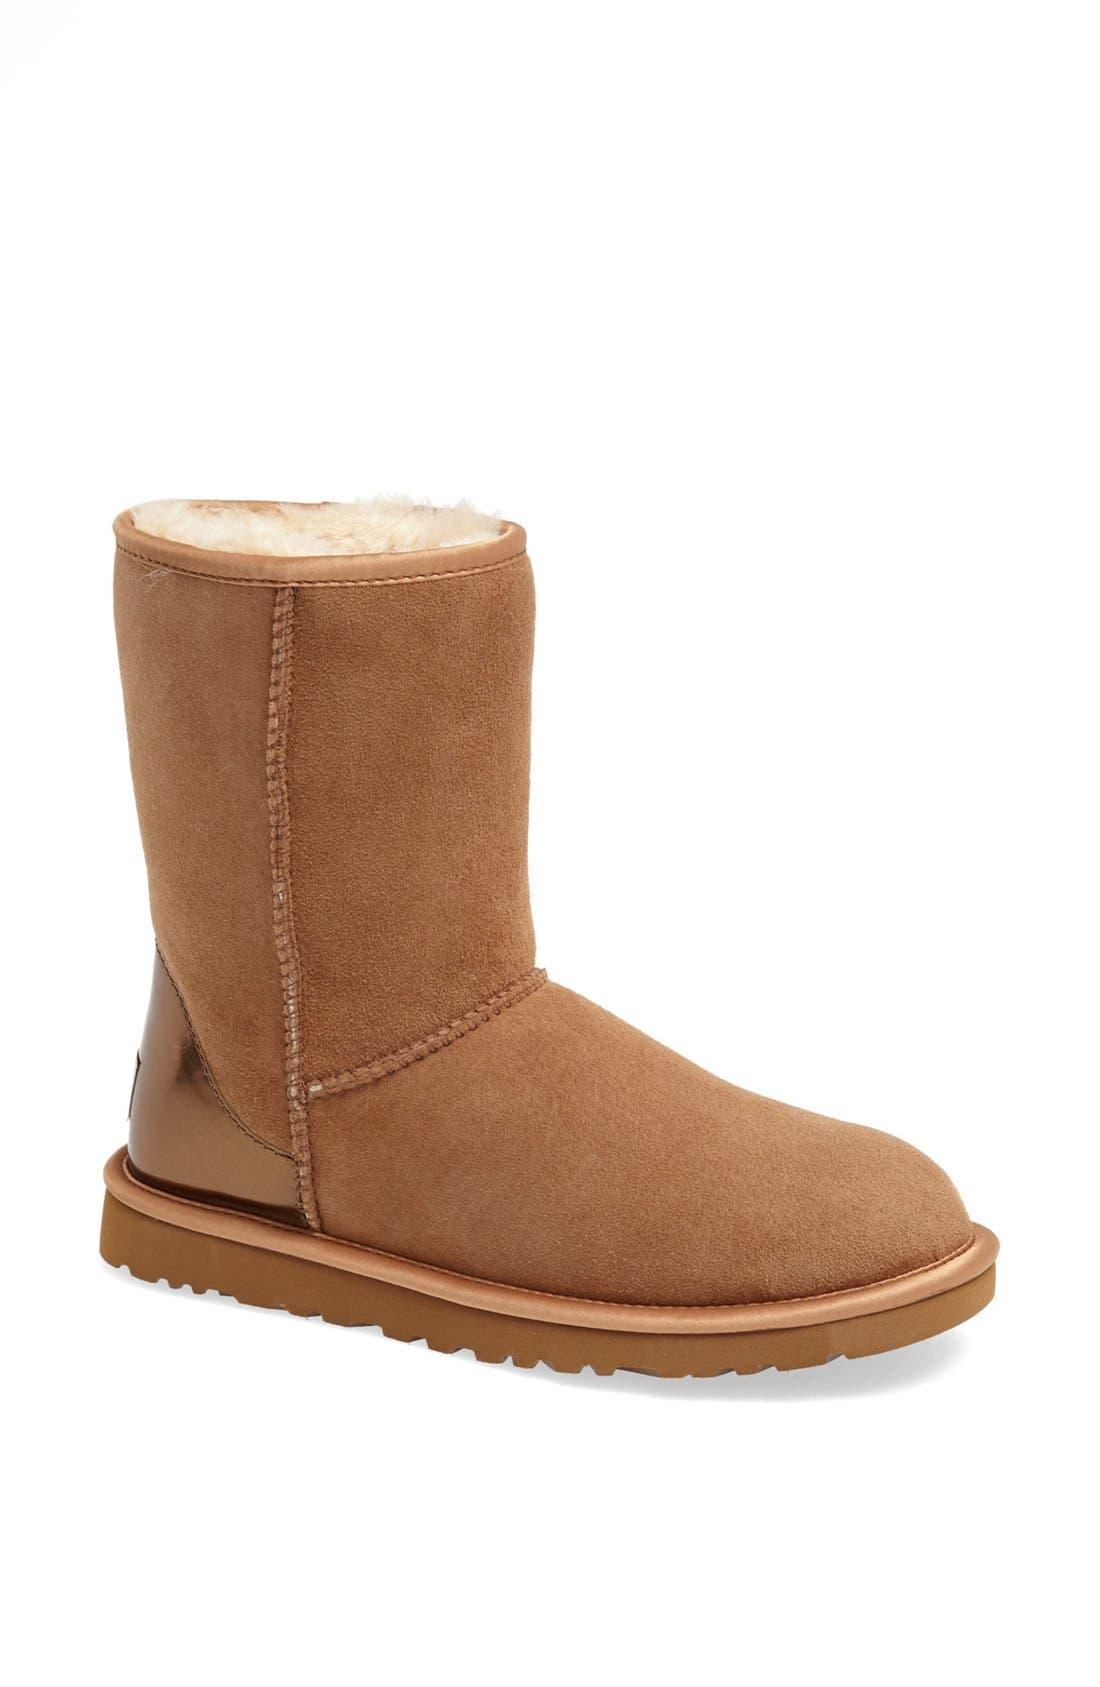 Alternate Image 1 Selected - UGG® Australia 'Classic Short' Metallic Patent Boot (Women)